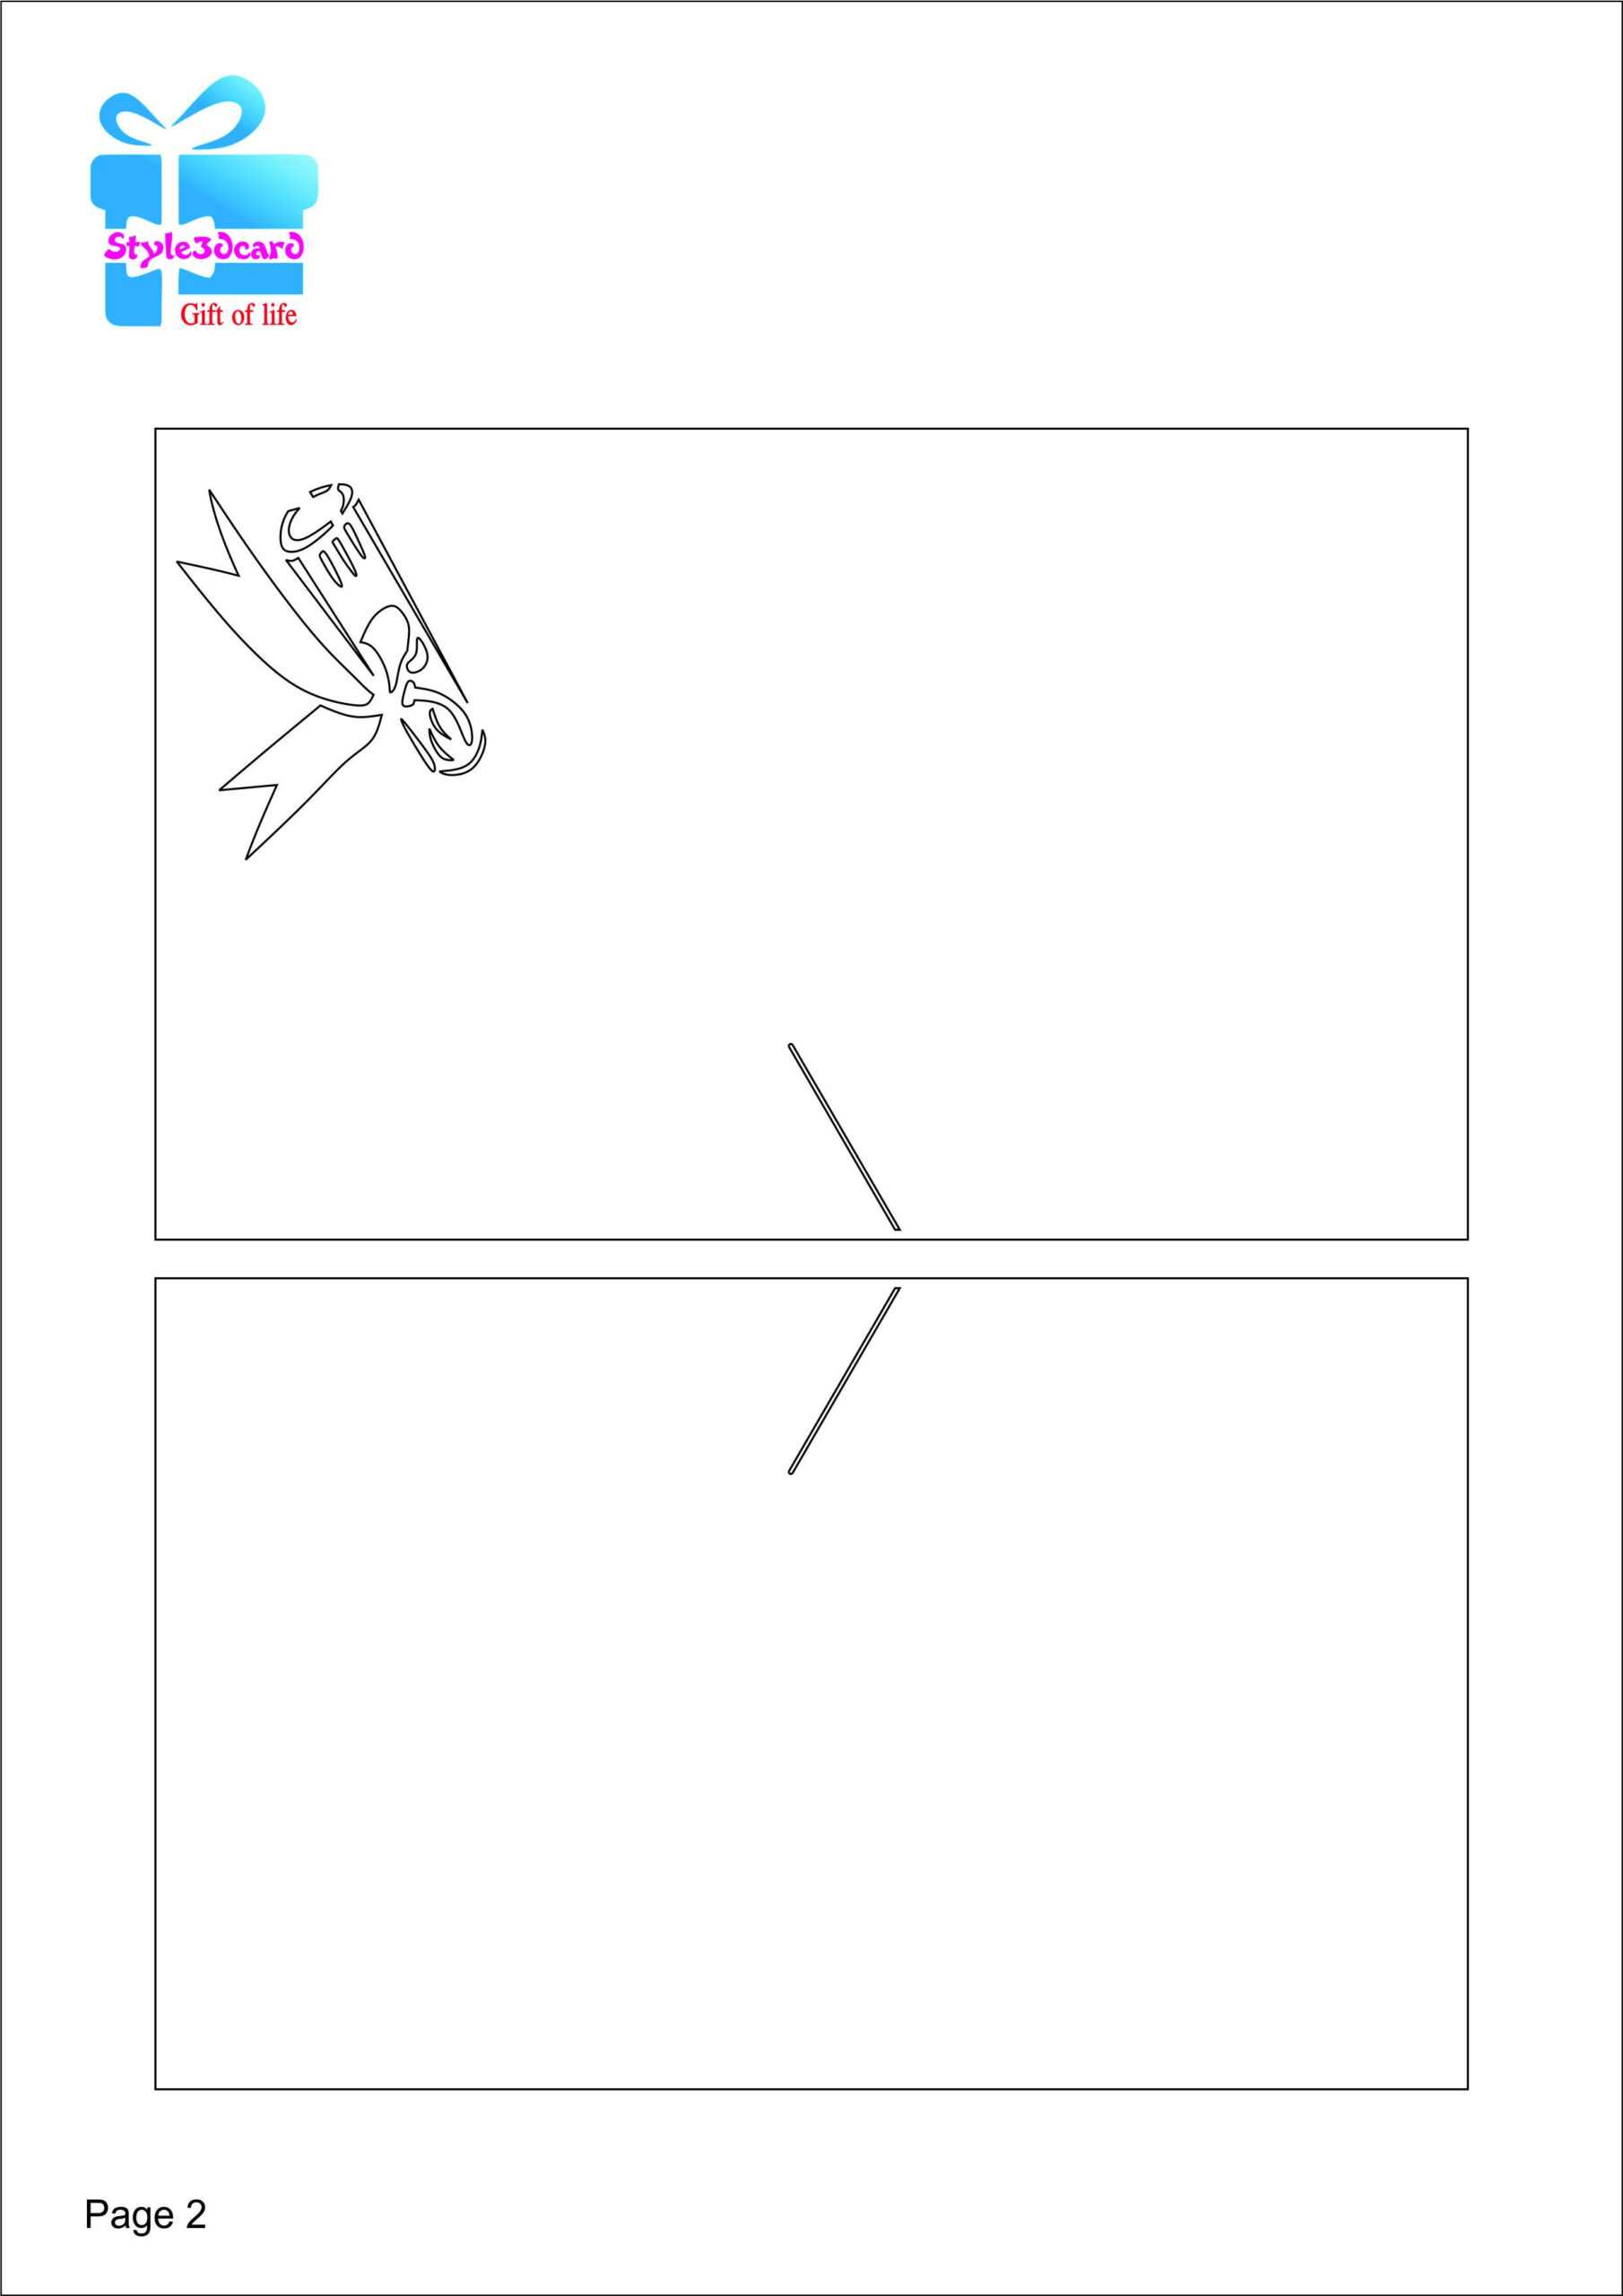 Pop Up Papercraft Graduation Cap 3D Pop Up Card Kirigami Within Graduation Pop Up Card Template